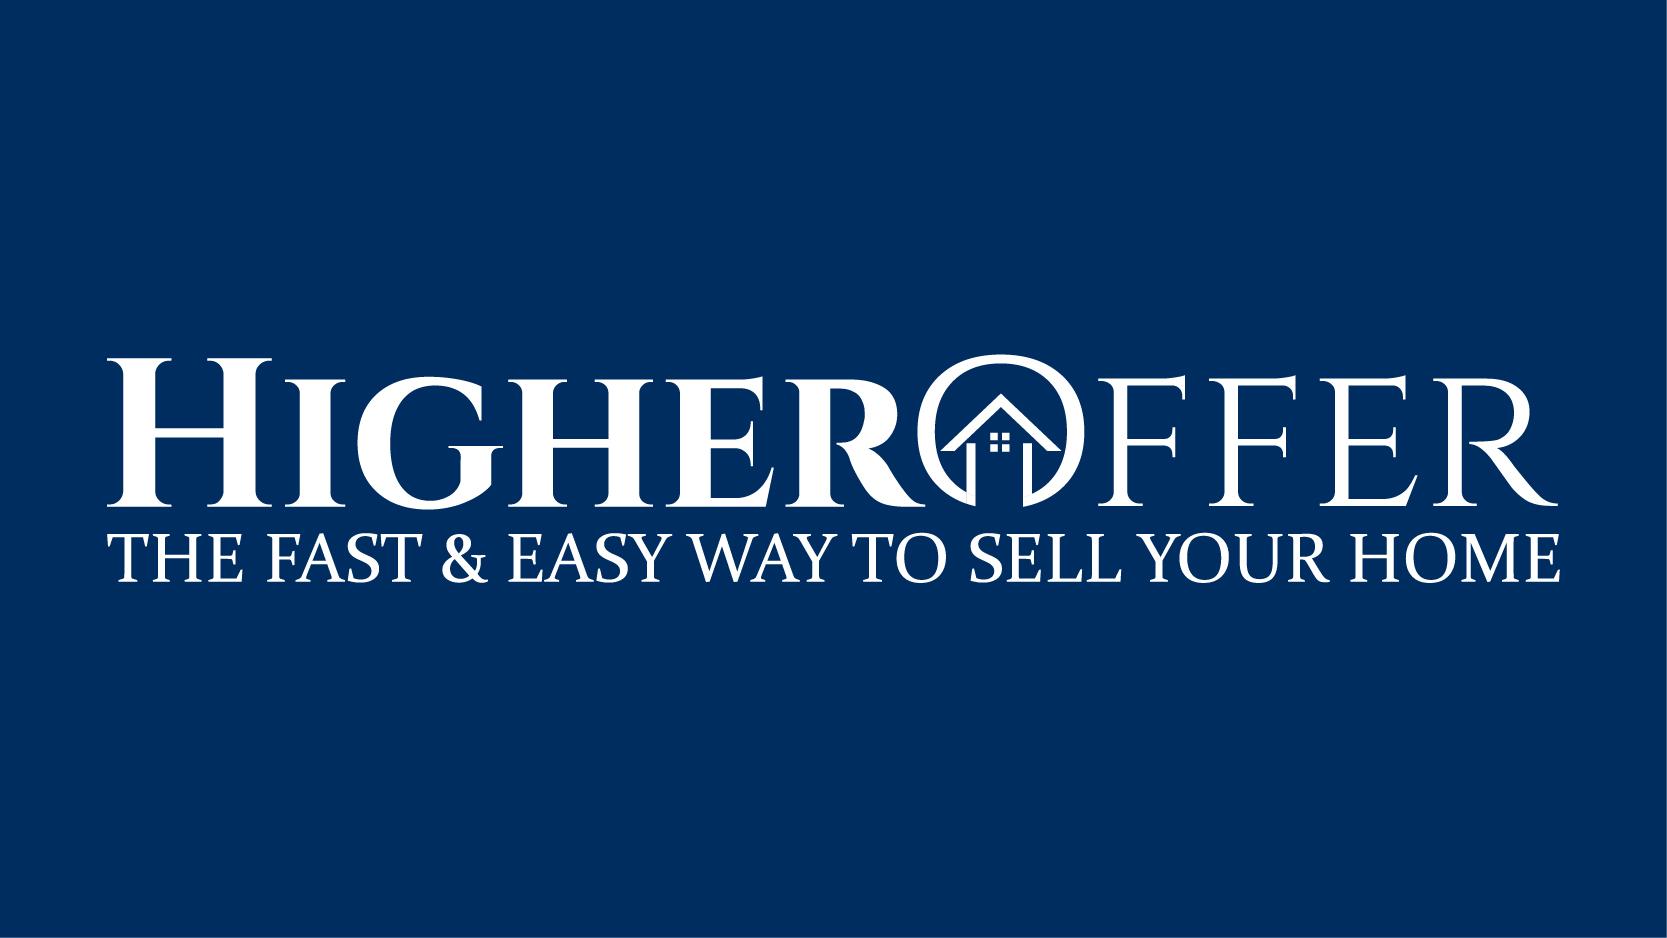 HigherOffer logo